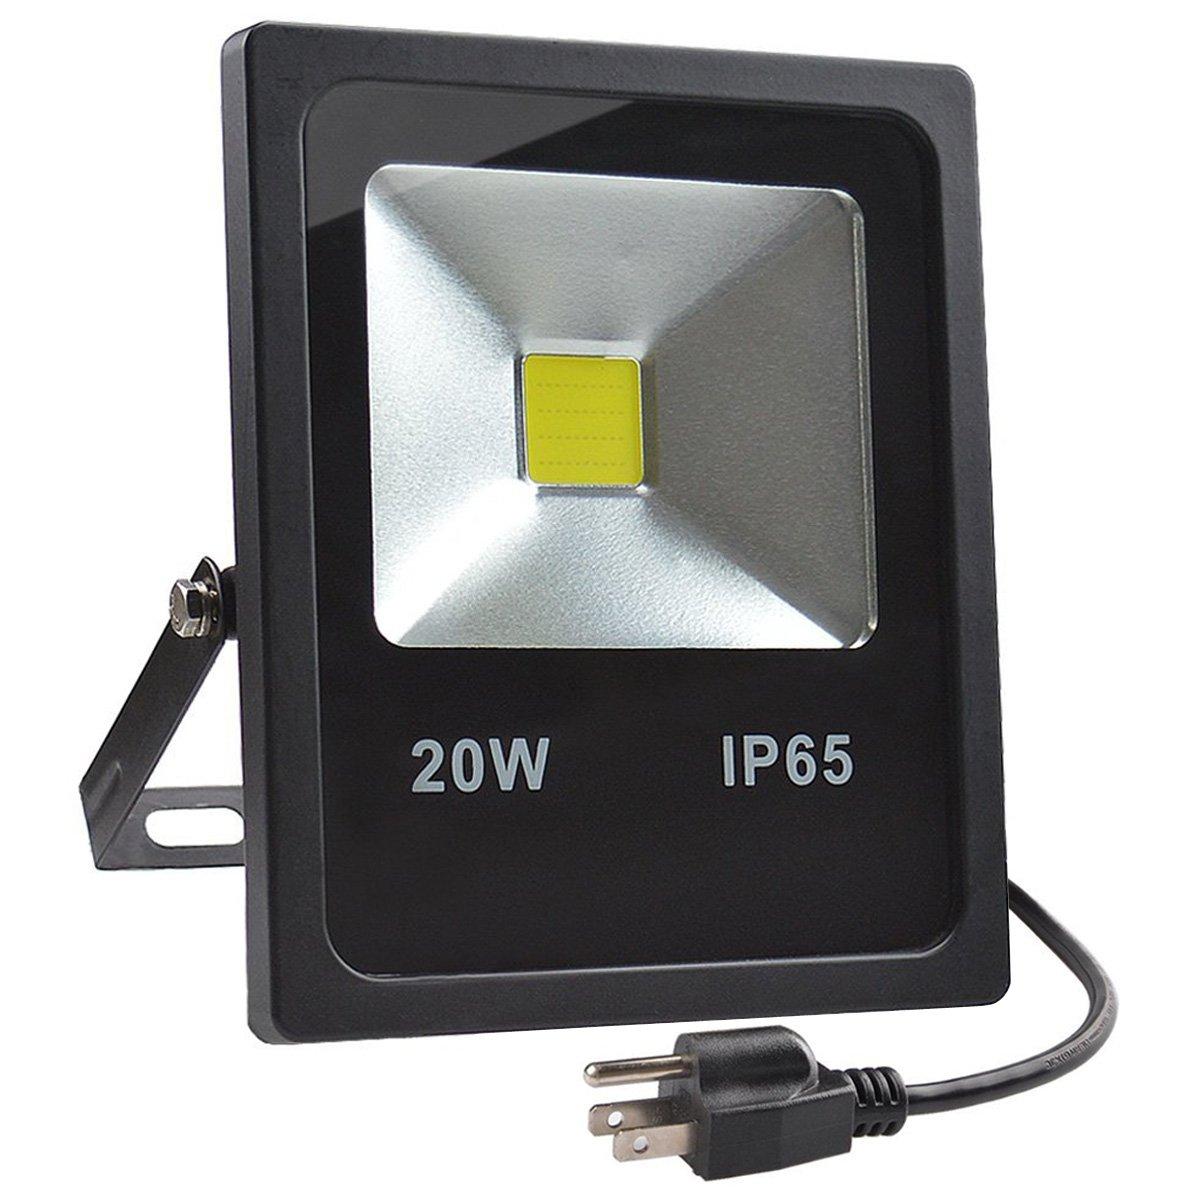 GLW 20W LED Flood Lights,100W Halogen Bulb Equivalent,IP65 Waterproof Warm White Outdoor Work Light,1800lm,3000K,110V Floodlight with US 3-plug